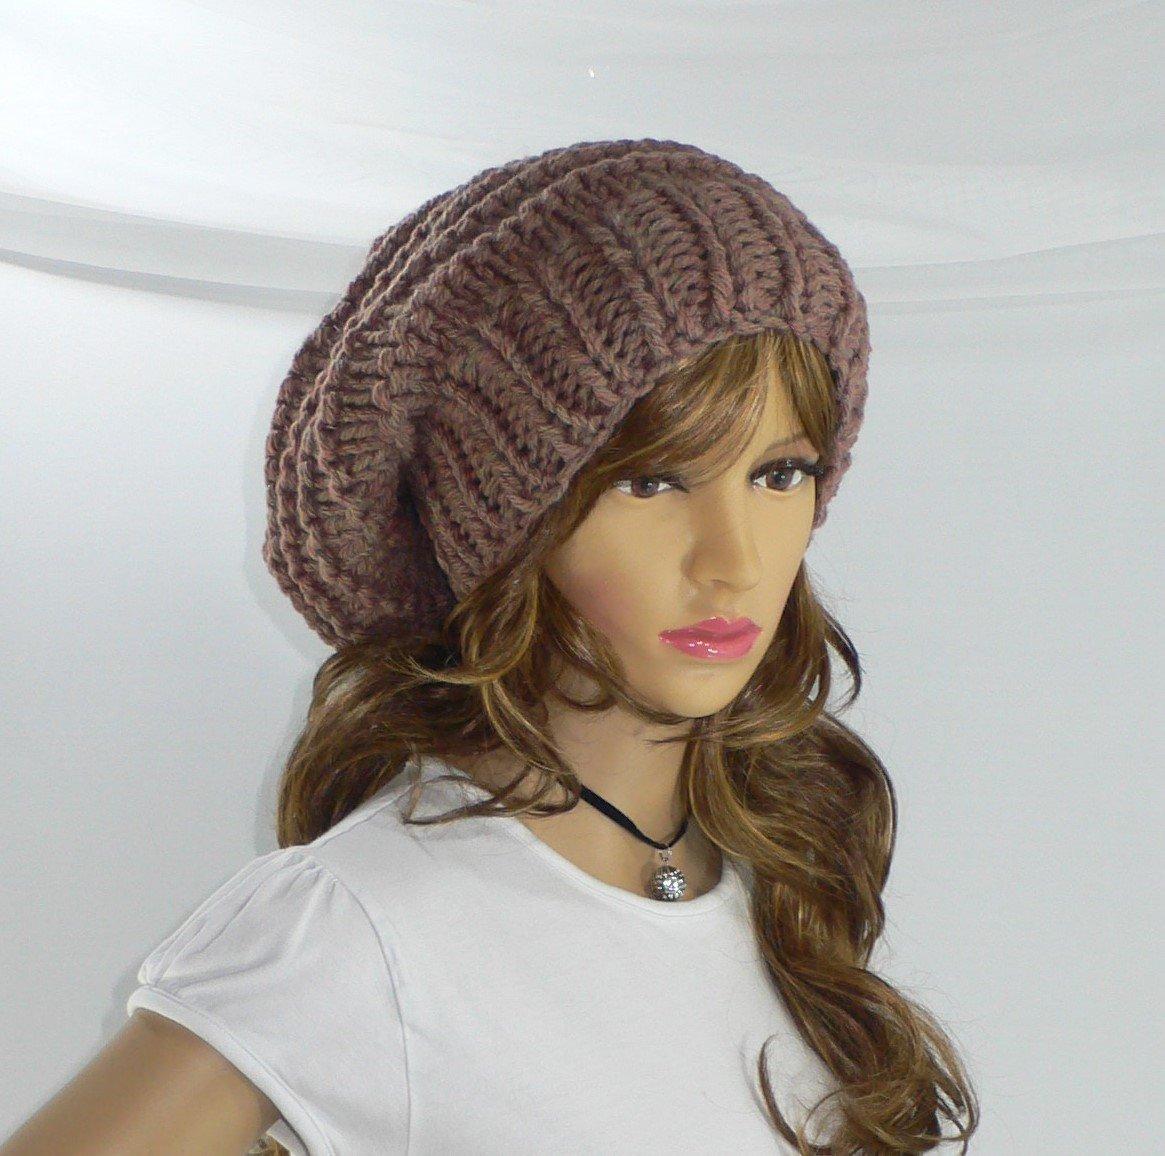 5bad722f045 ... Women Beige Knit Hat Goth Hat Pixie Hat Slouchy Knit Hat Slouch Beanie  Hand Knit Hat Knit Beanie Woodland Clothing https   etsy.me 2PoBsyY   accessories ...